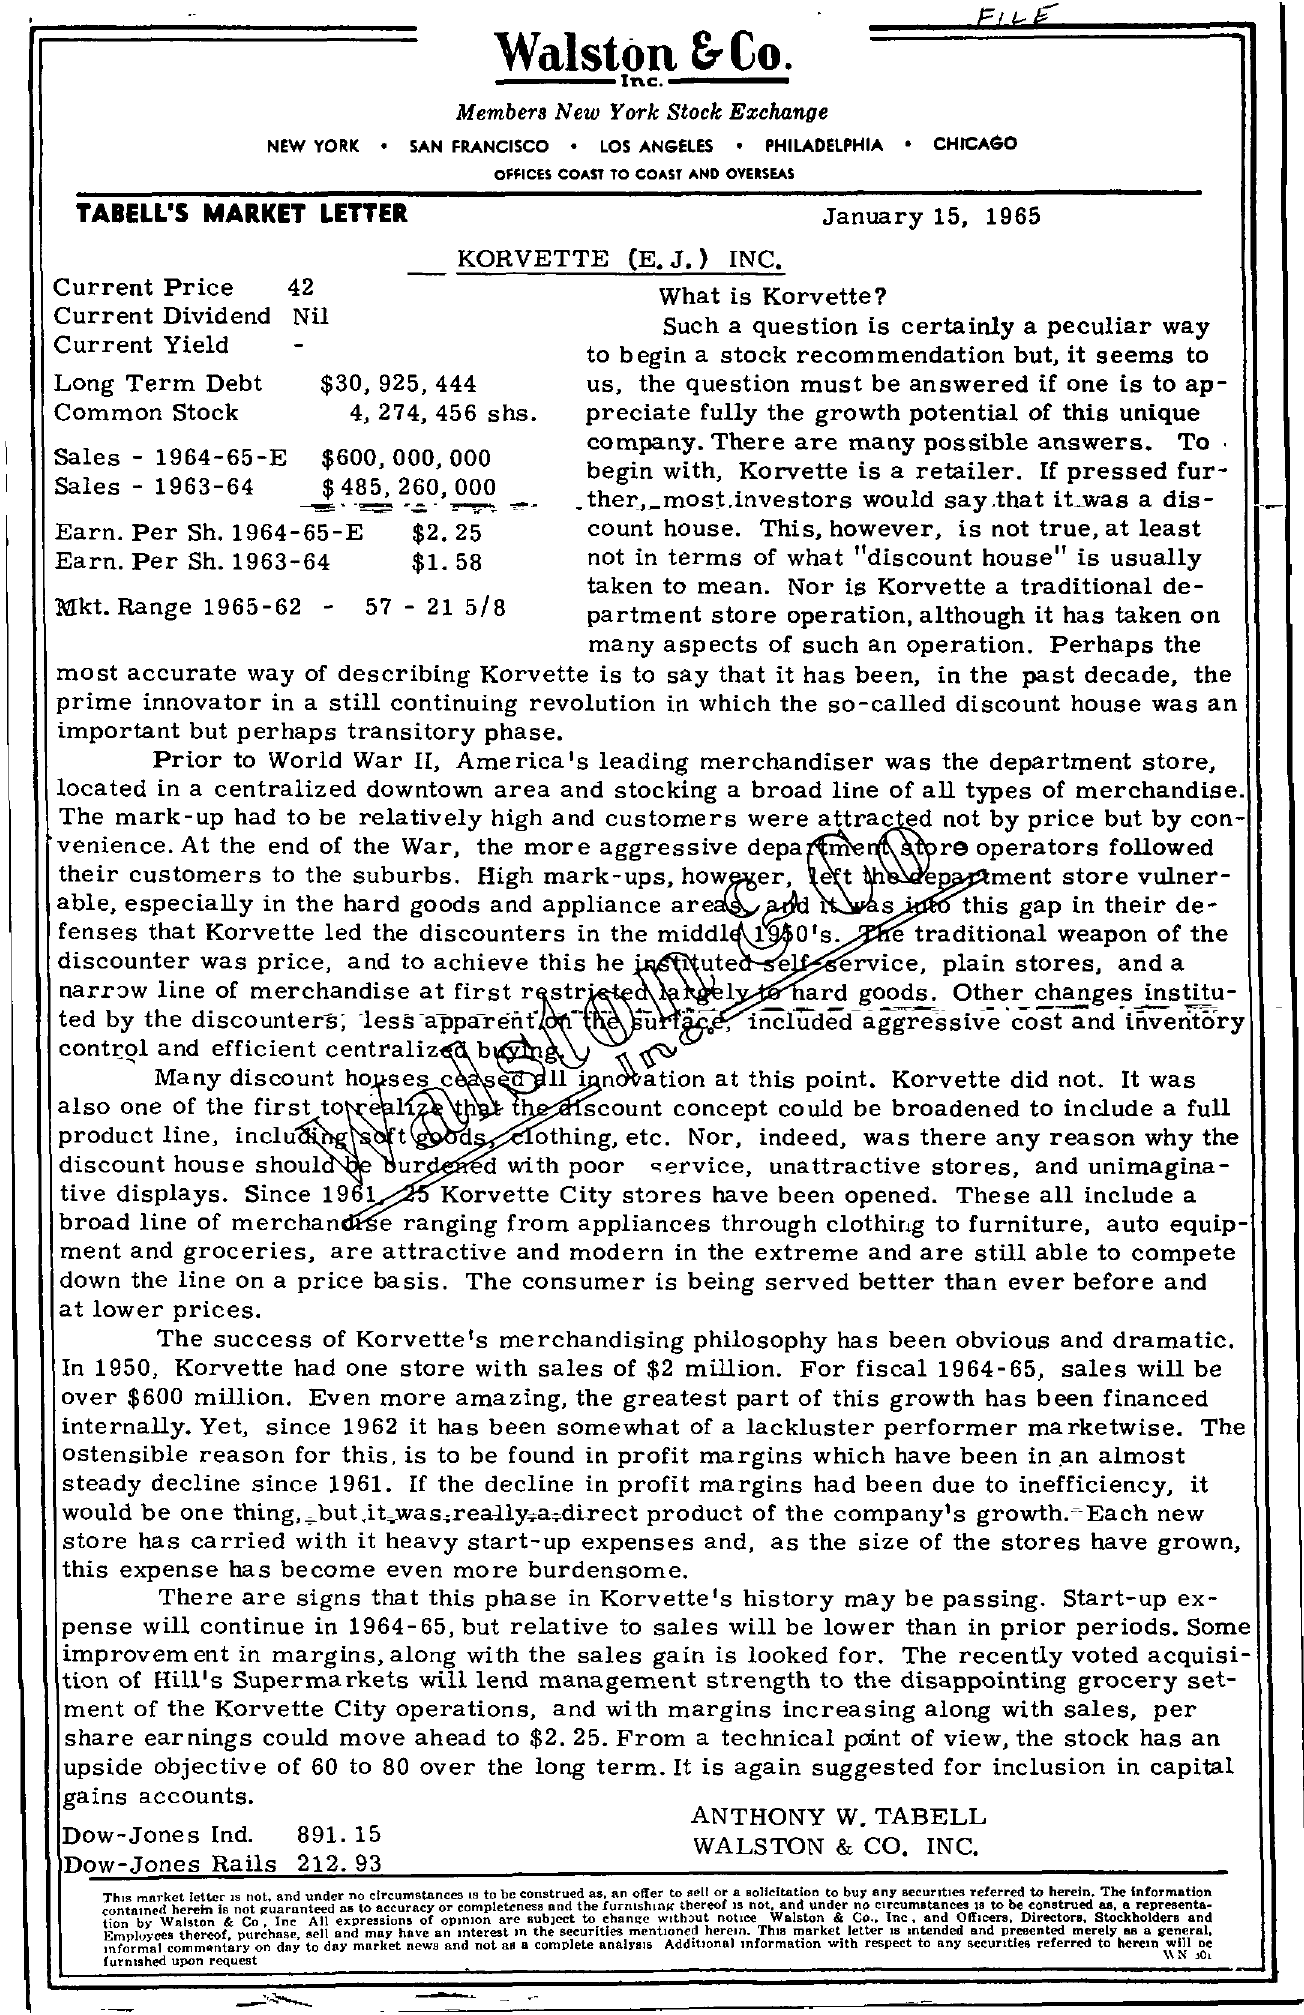 Tabell's Market Letter - January 15, 1965